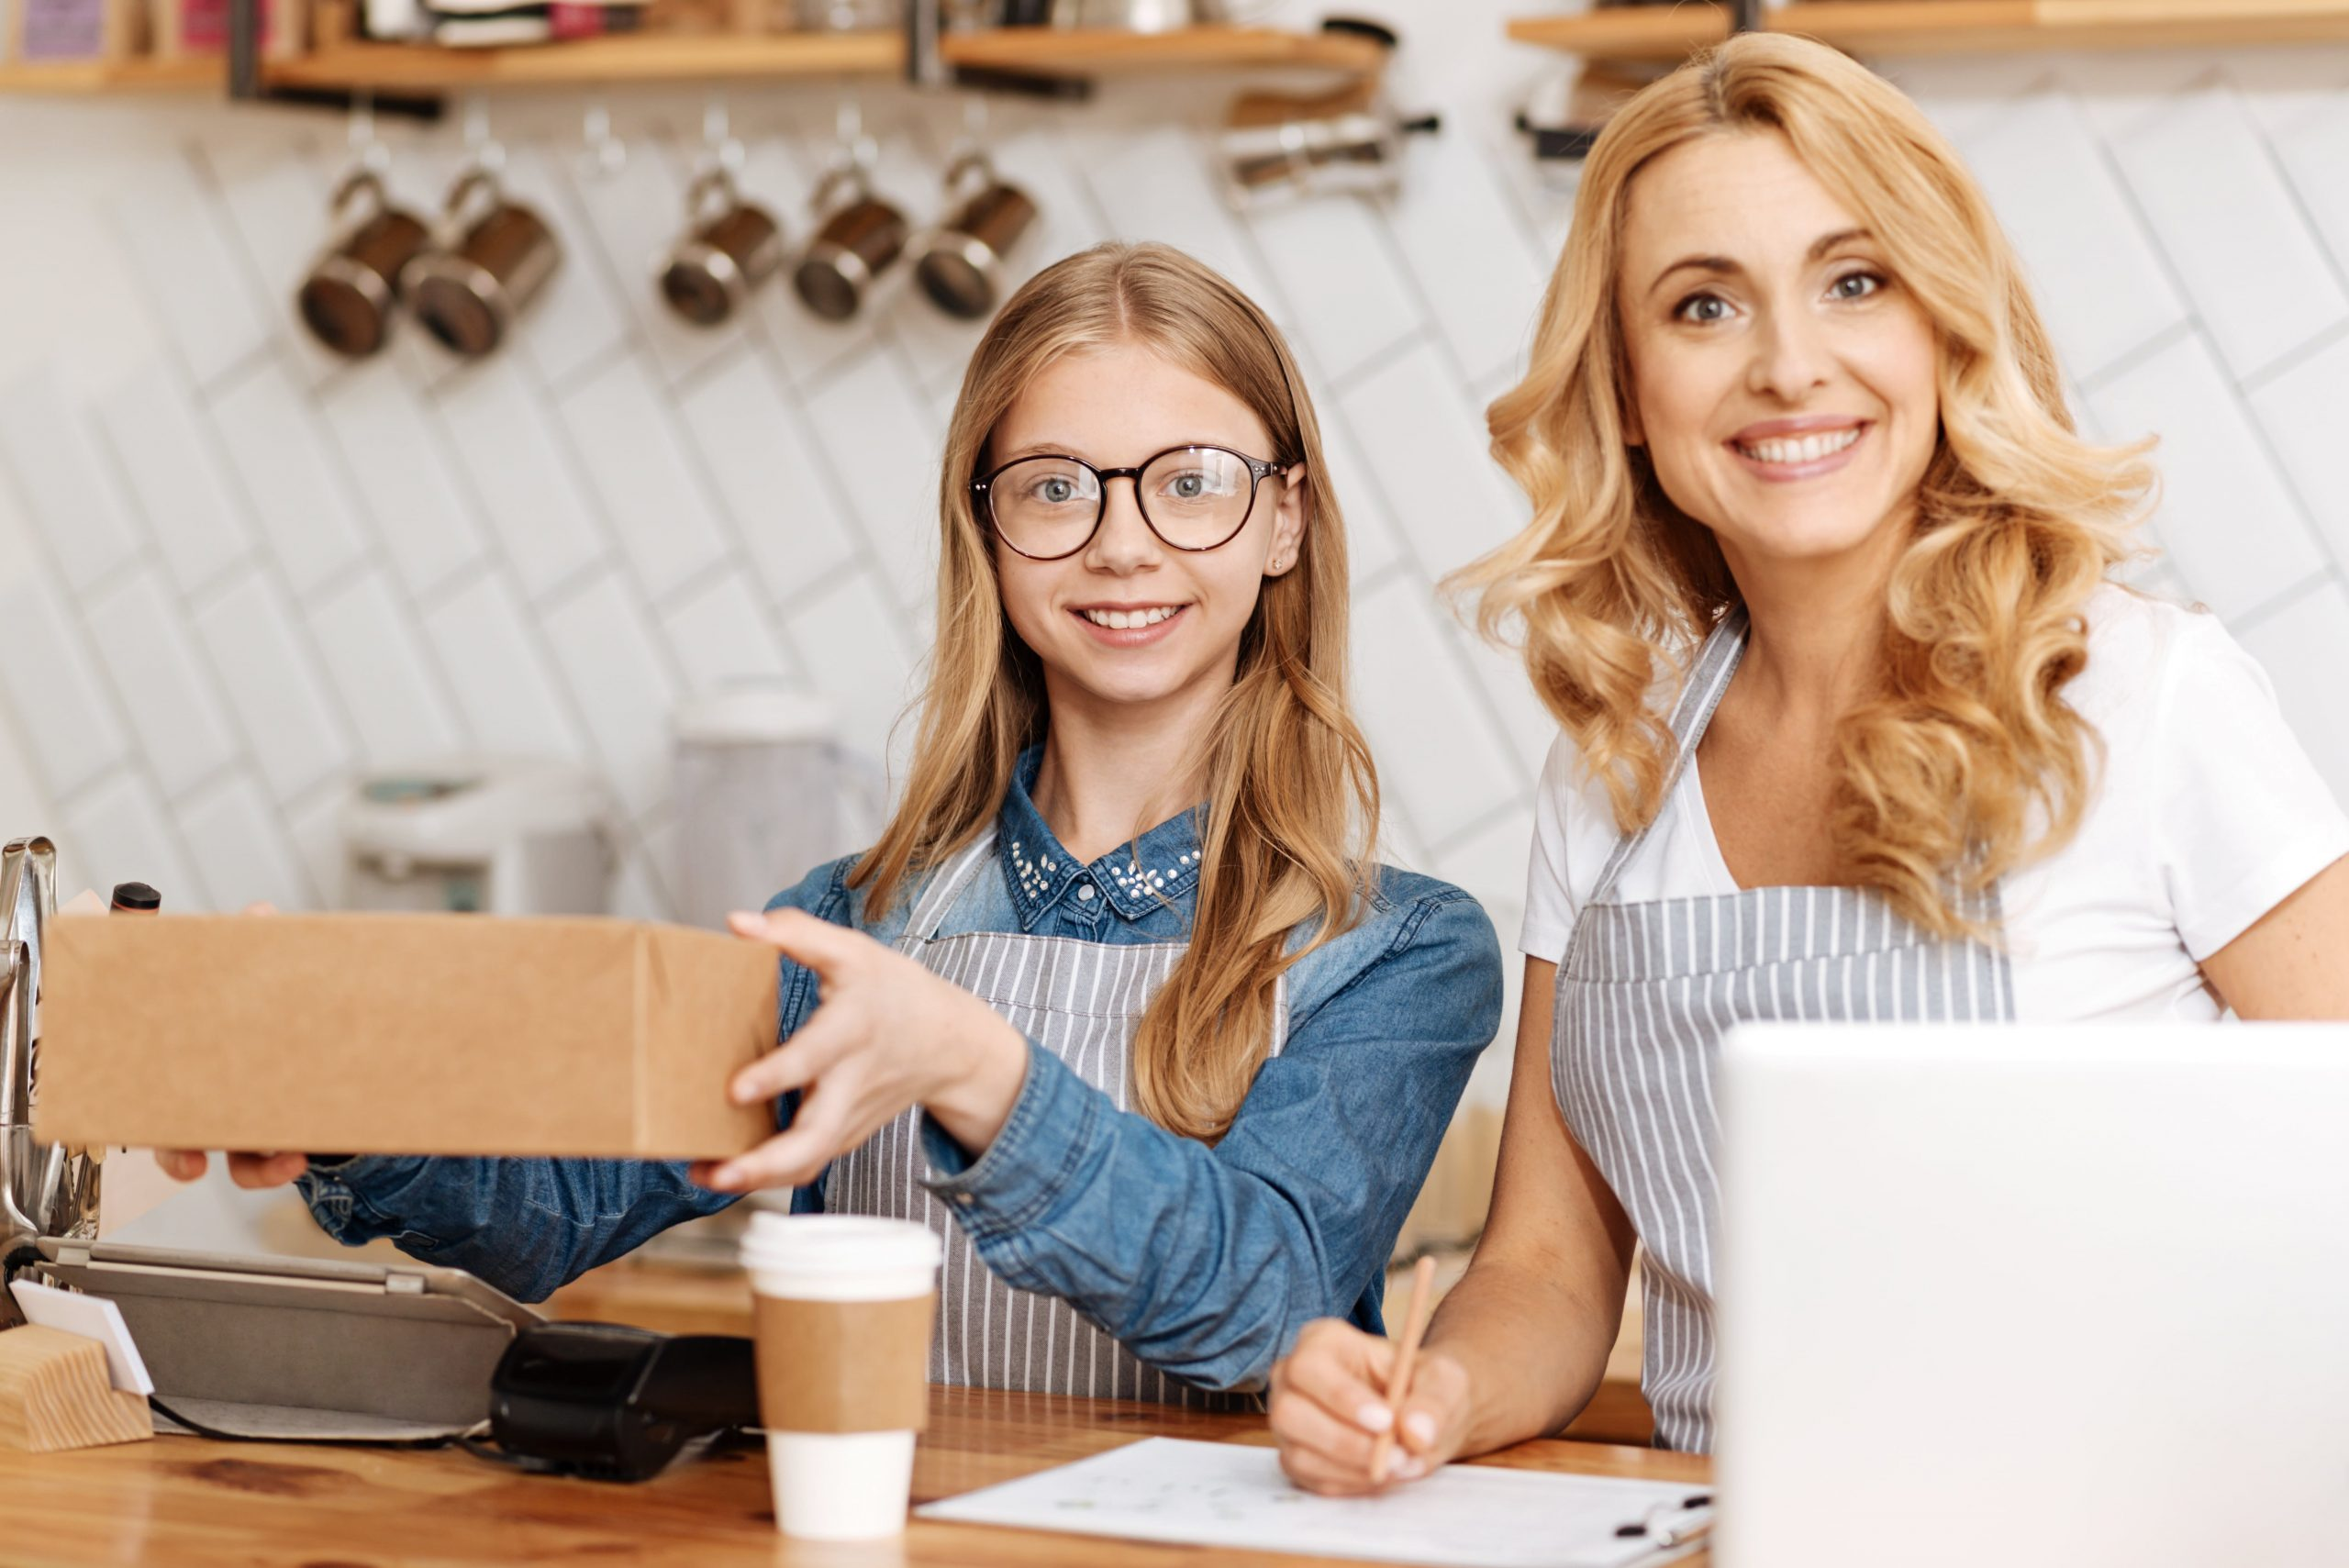 Teen Working in coffee shop